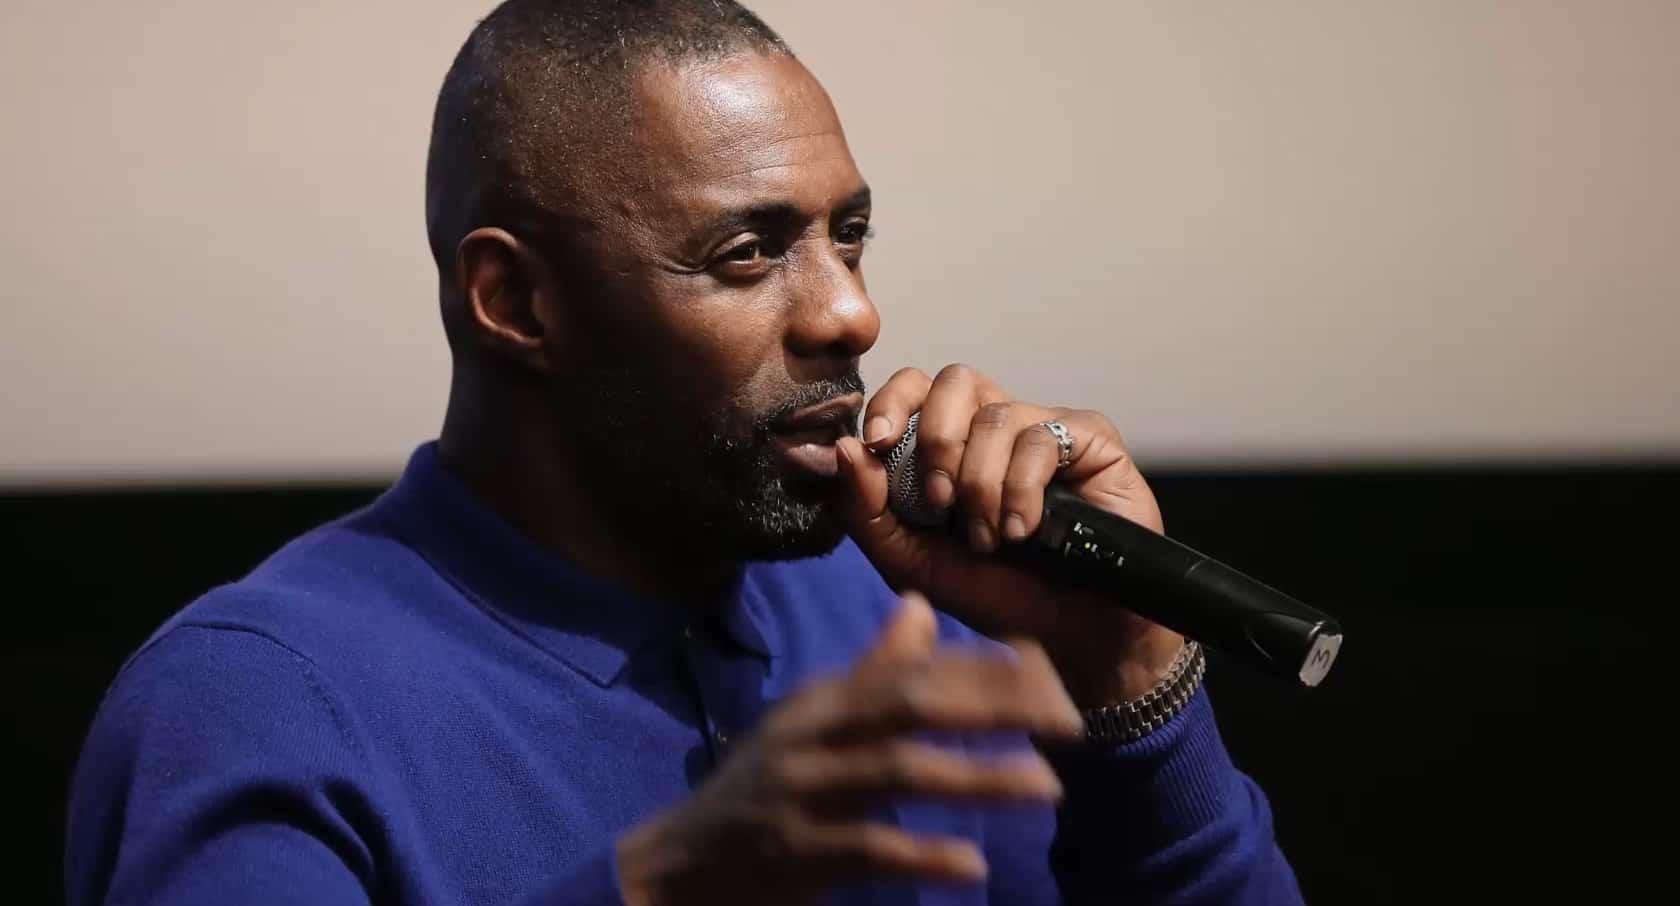 Idris Elba Drops Slow Jams Playlist Featuring Jodeci, Al Green & More